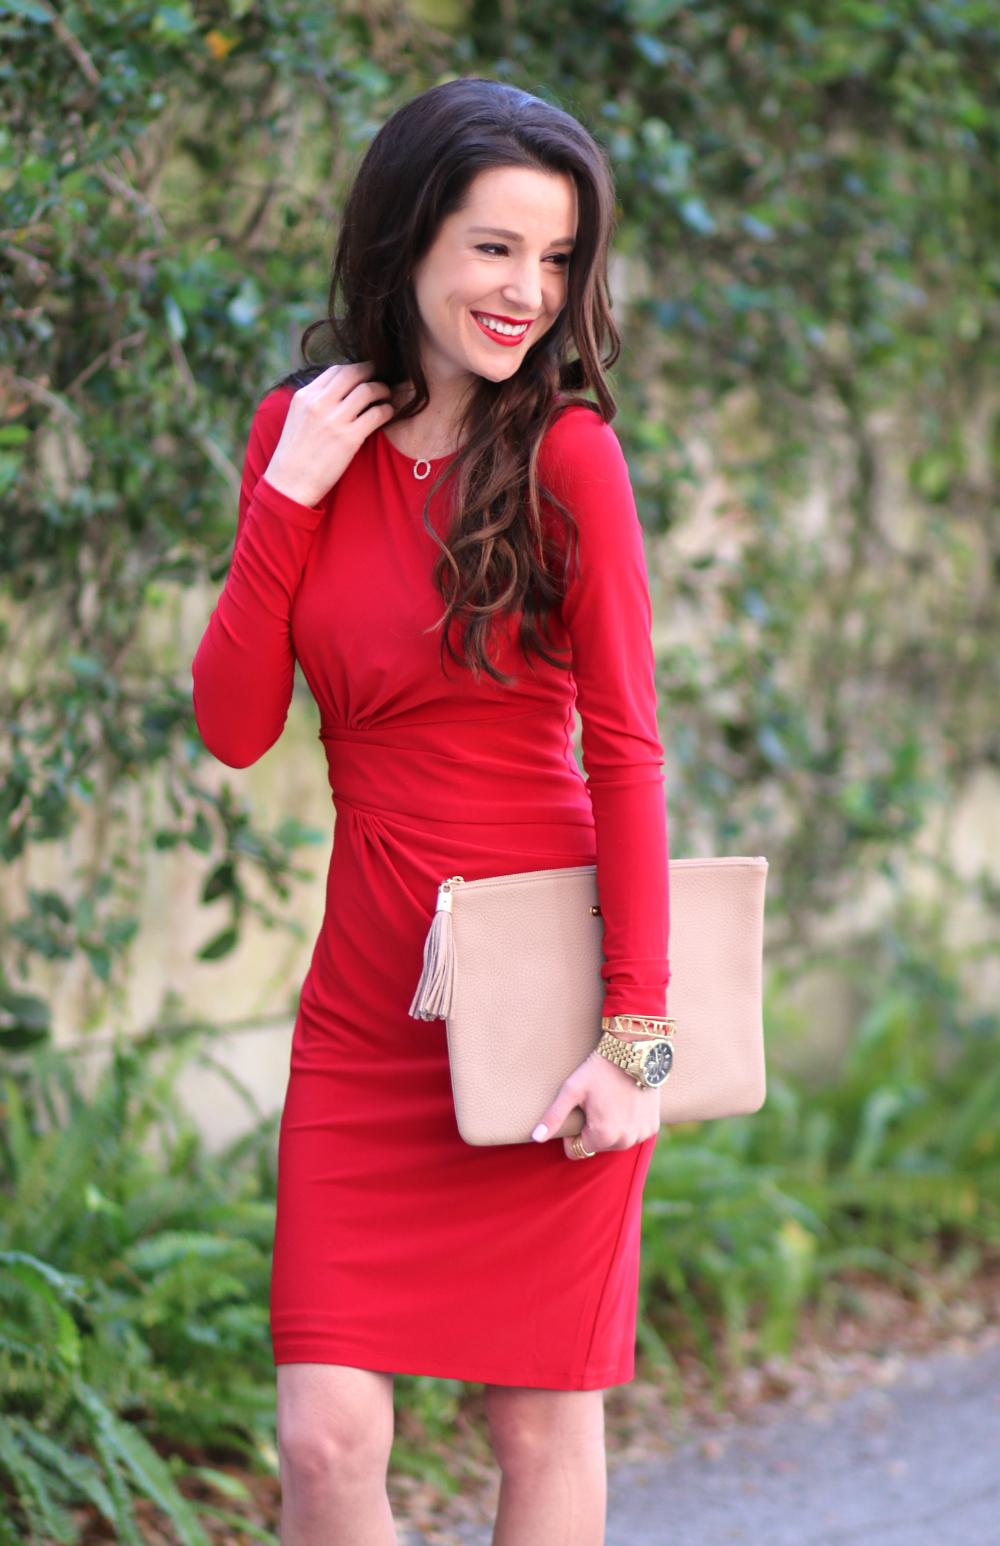 Ralph Lauren Red Crewneck Dress | Diary of a Debutante